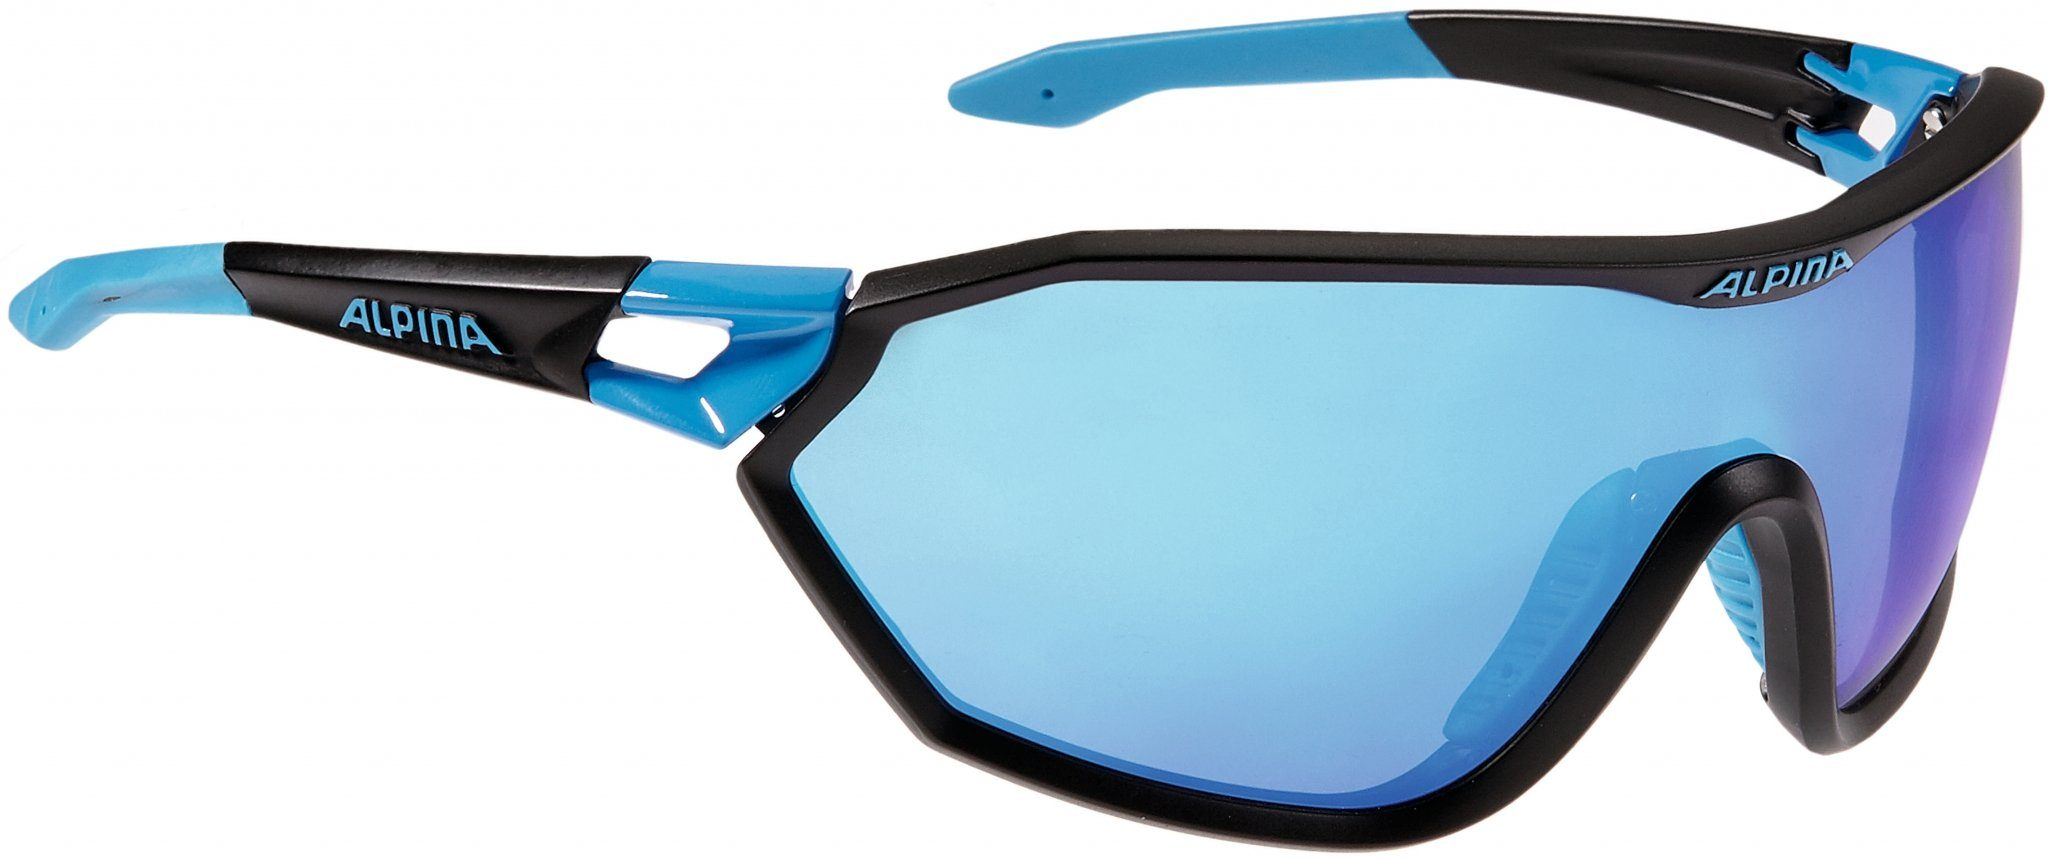 Alpina Sportbrille »S-Way VLM+«